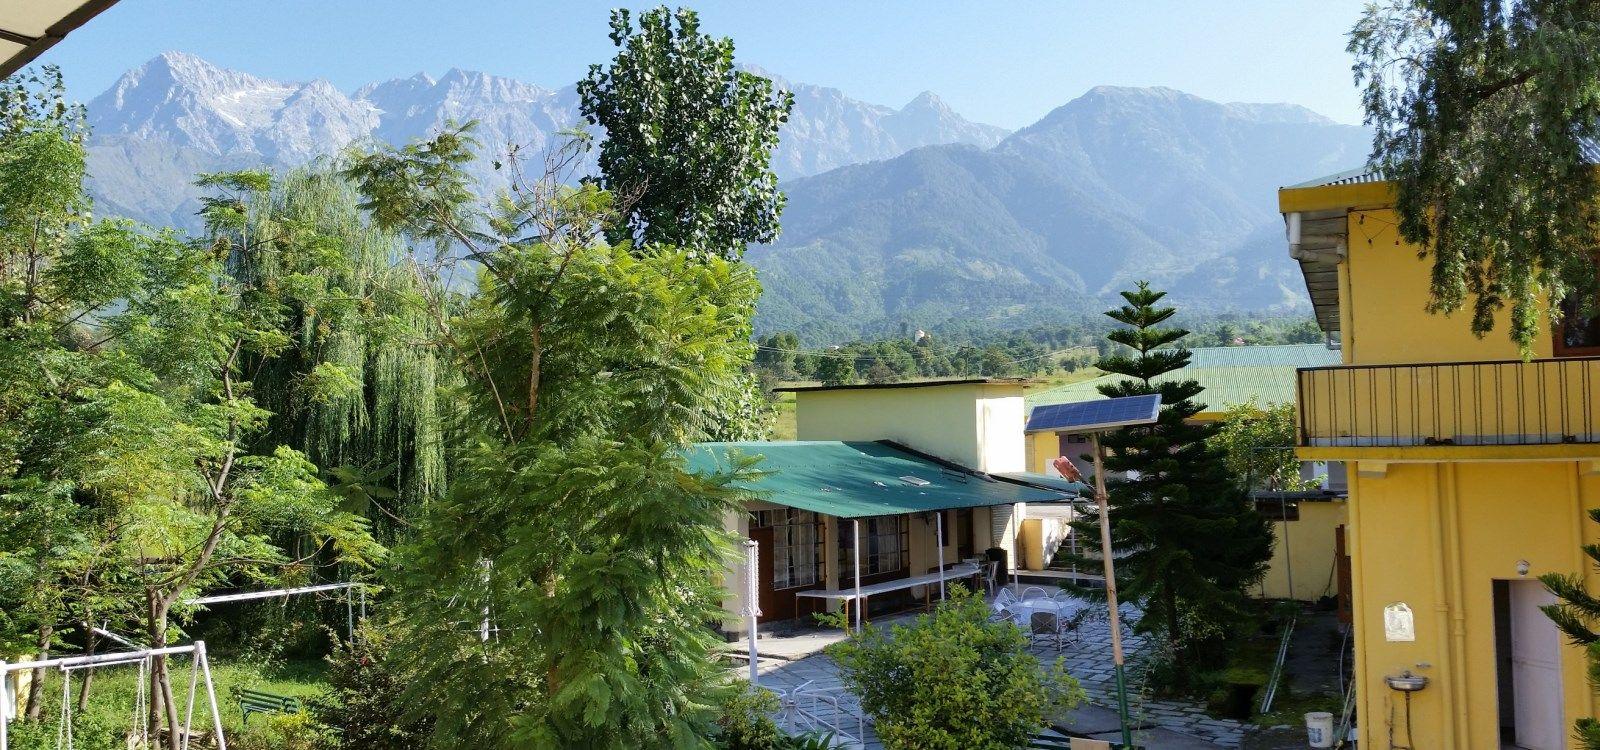 dharamsala-yoga-teacher-training-venue2